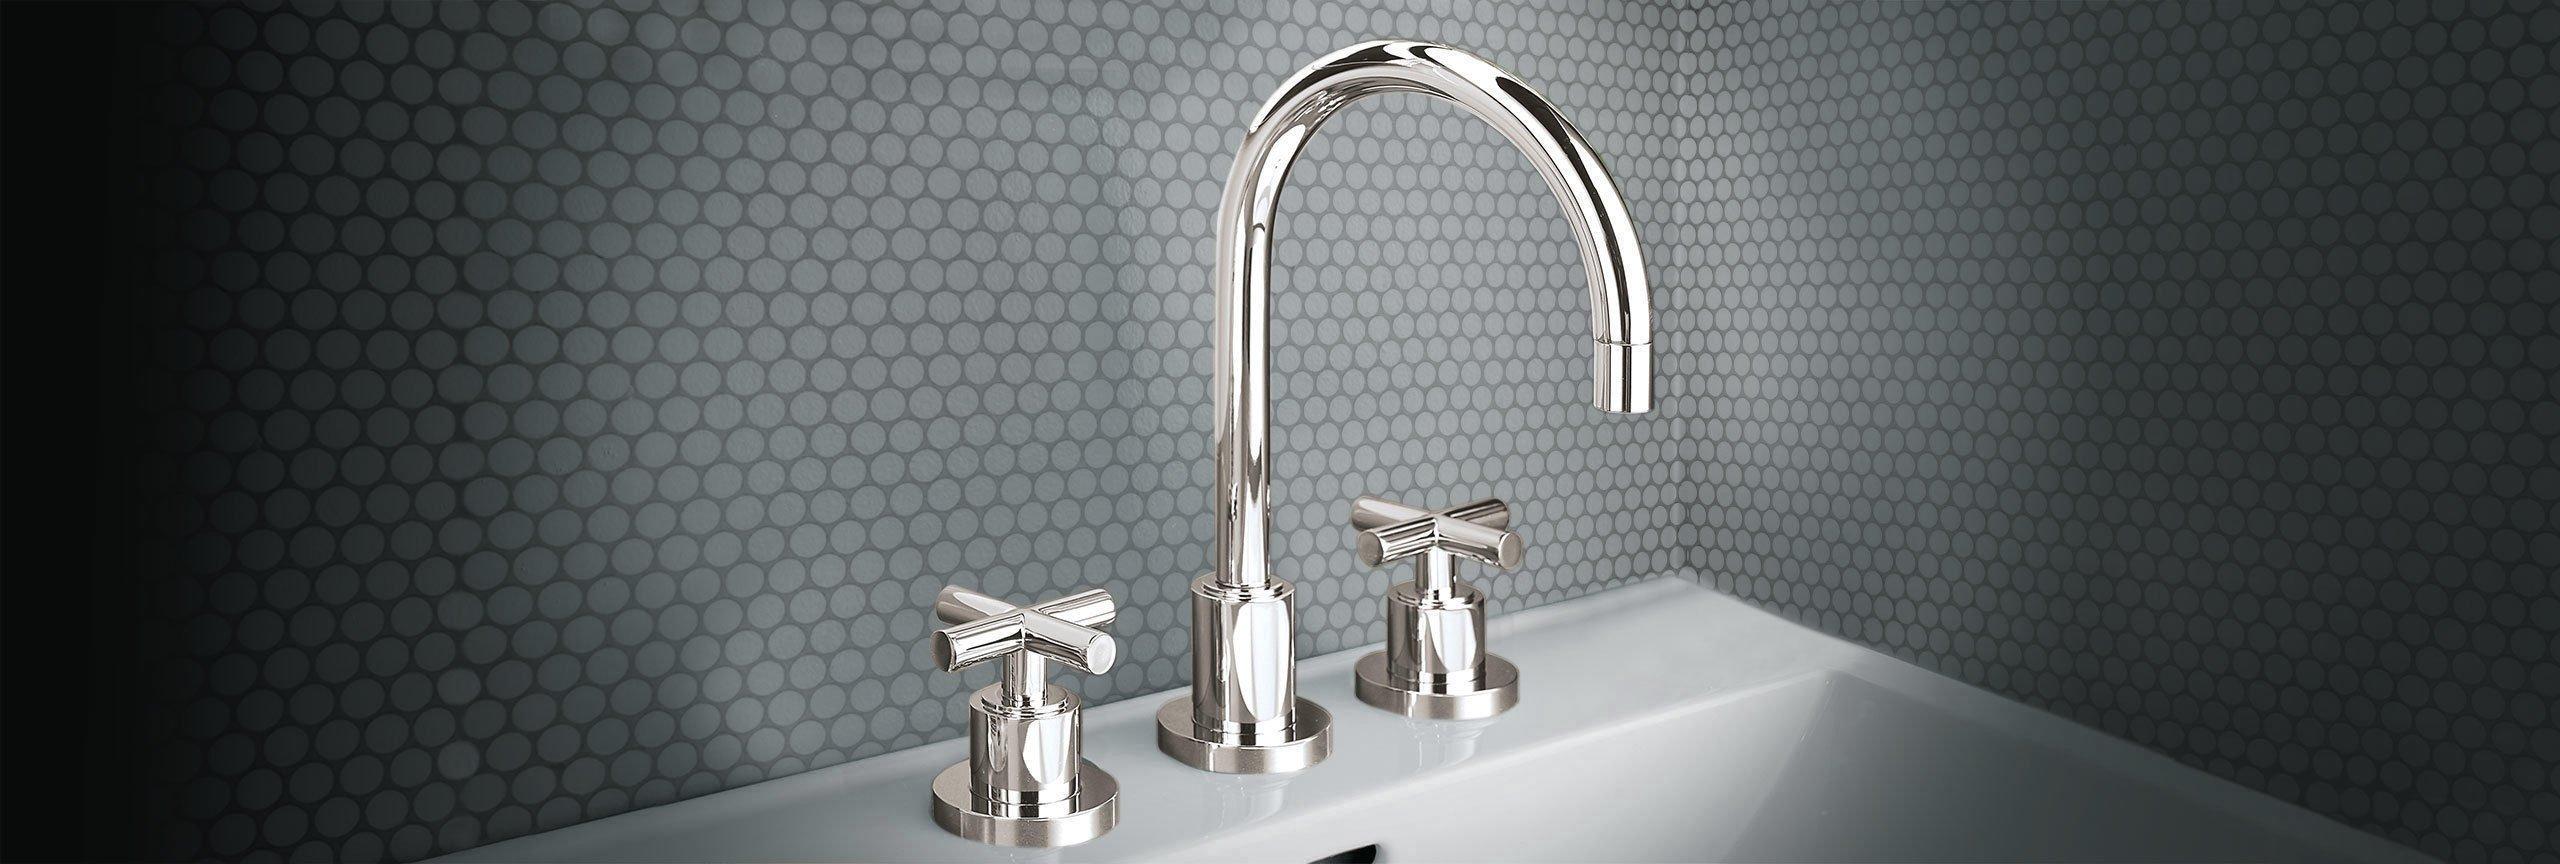 bathroom series Tiburon widespread faucet with cross handles